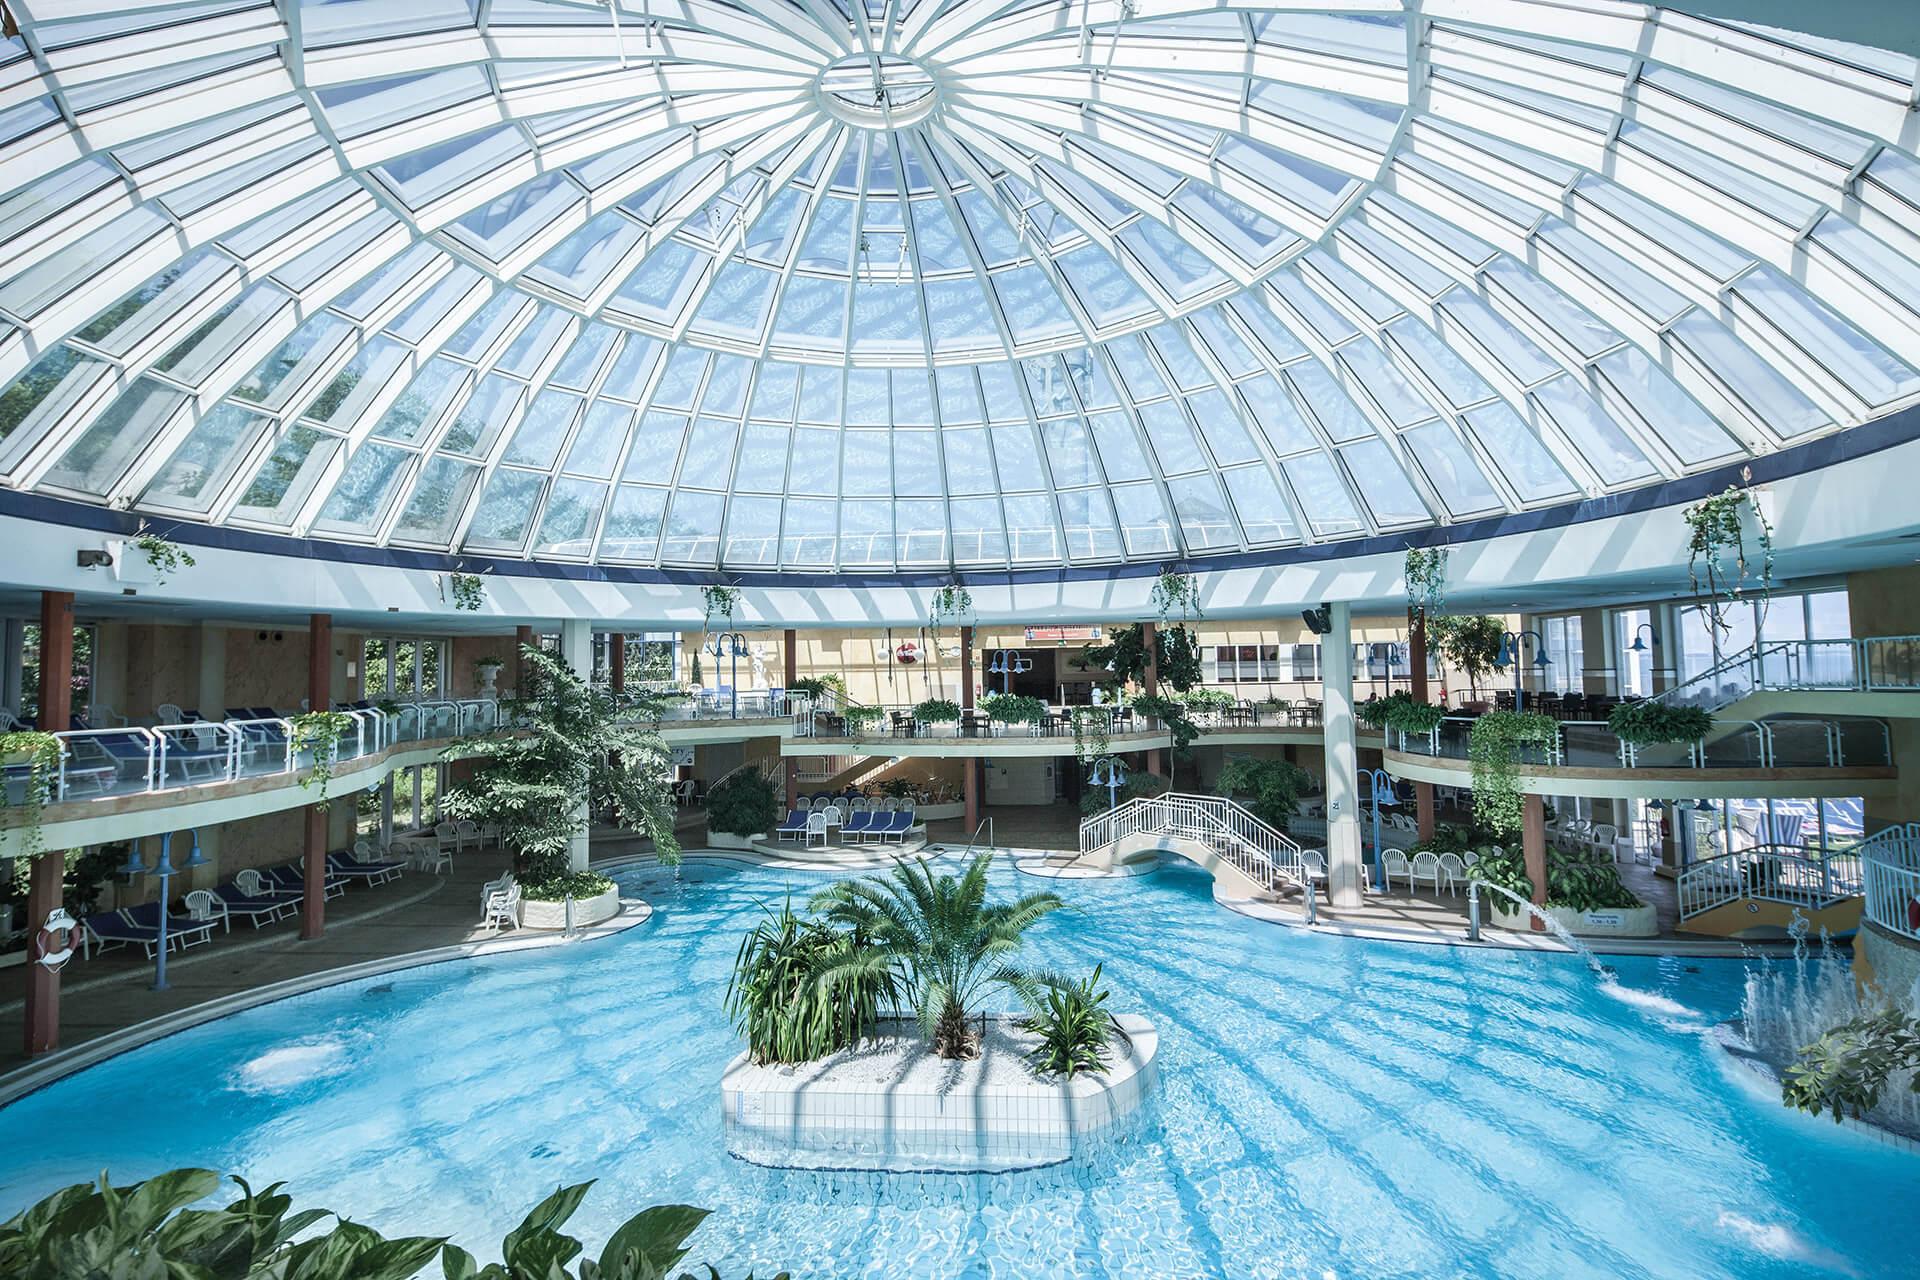 Kaltenkirchen therme hotel